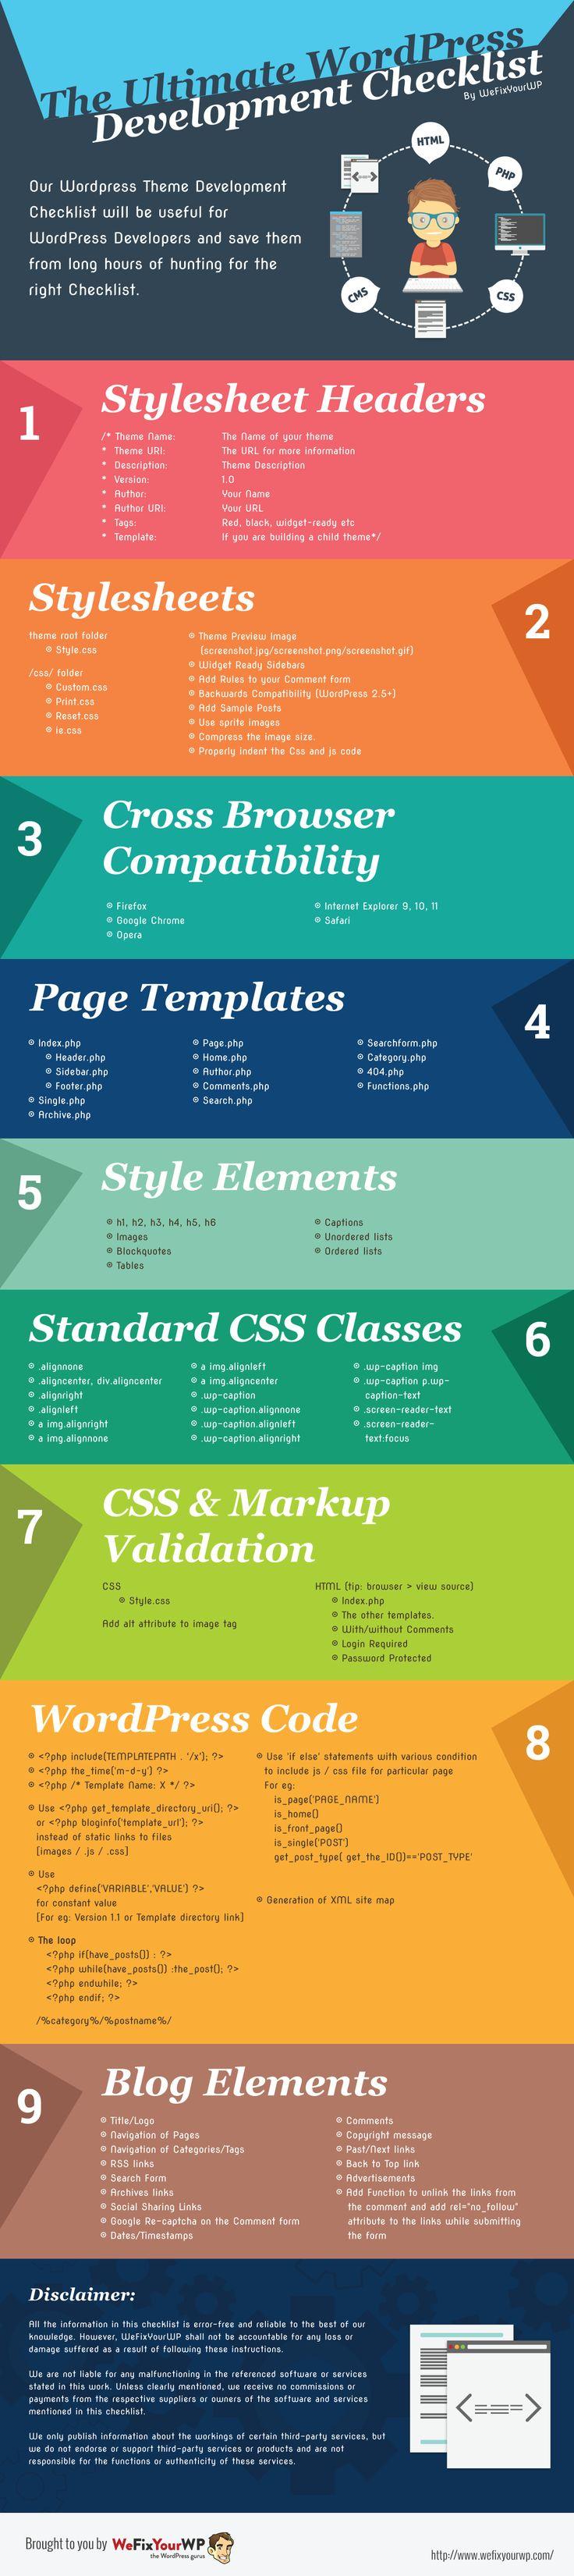 The Ultimate WordPress Development Checklist - #infographic